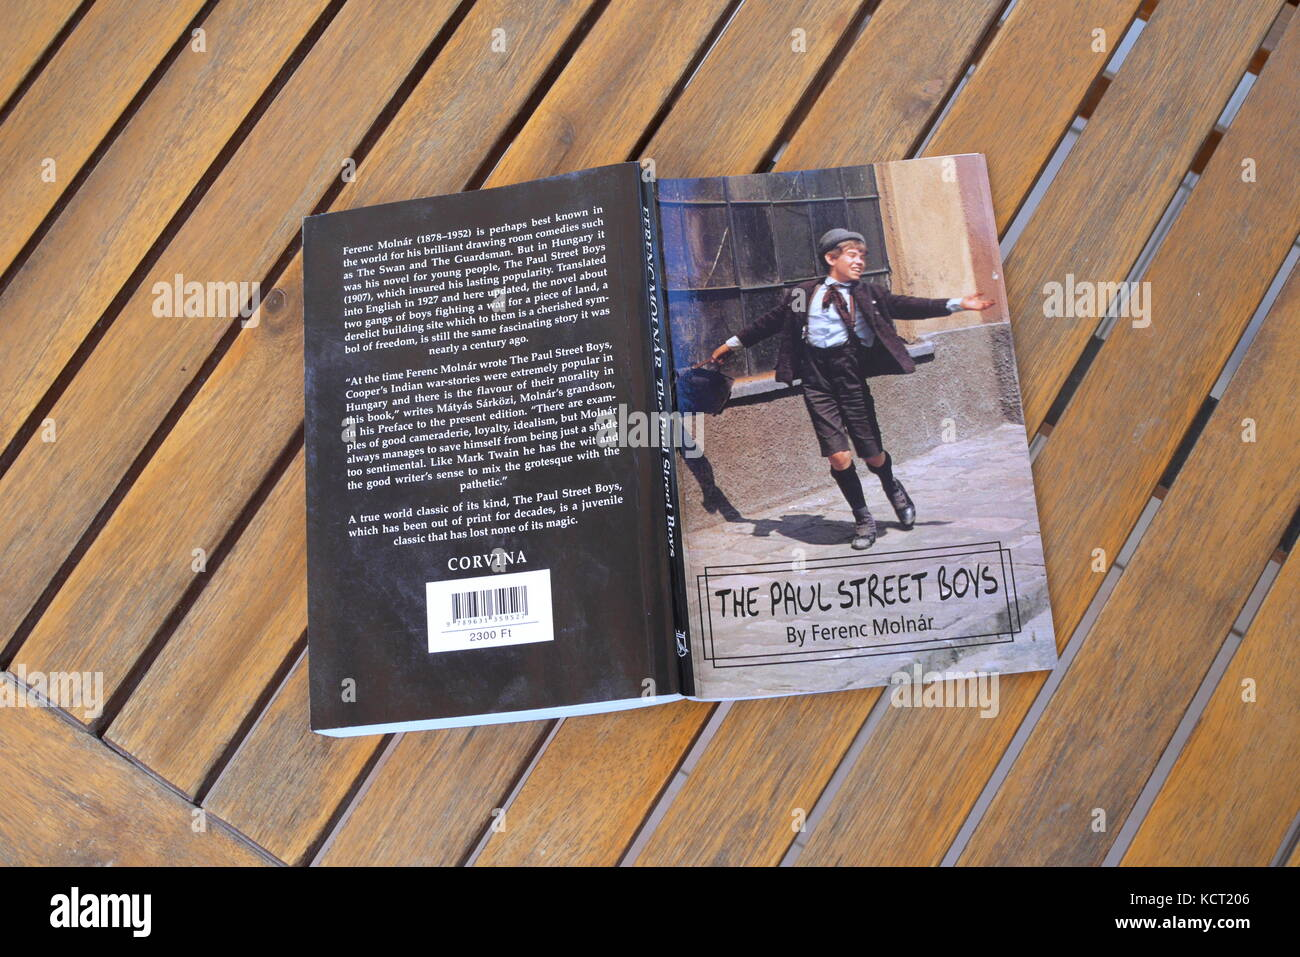 The Hungarian novel The Paul Street Boys, Pal utcai fiuk, by Ferenc Molnar - Stock Image